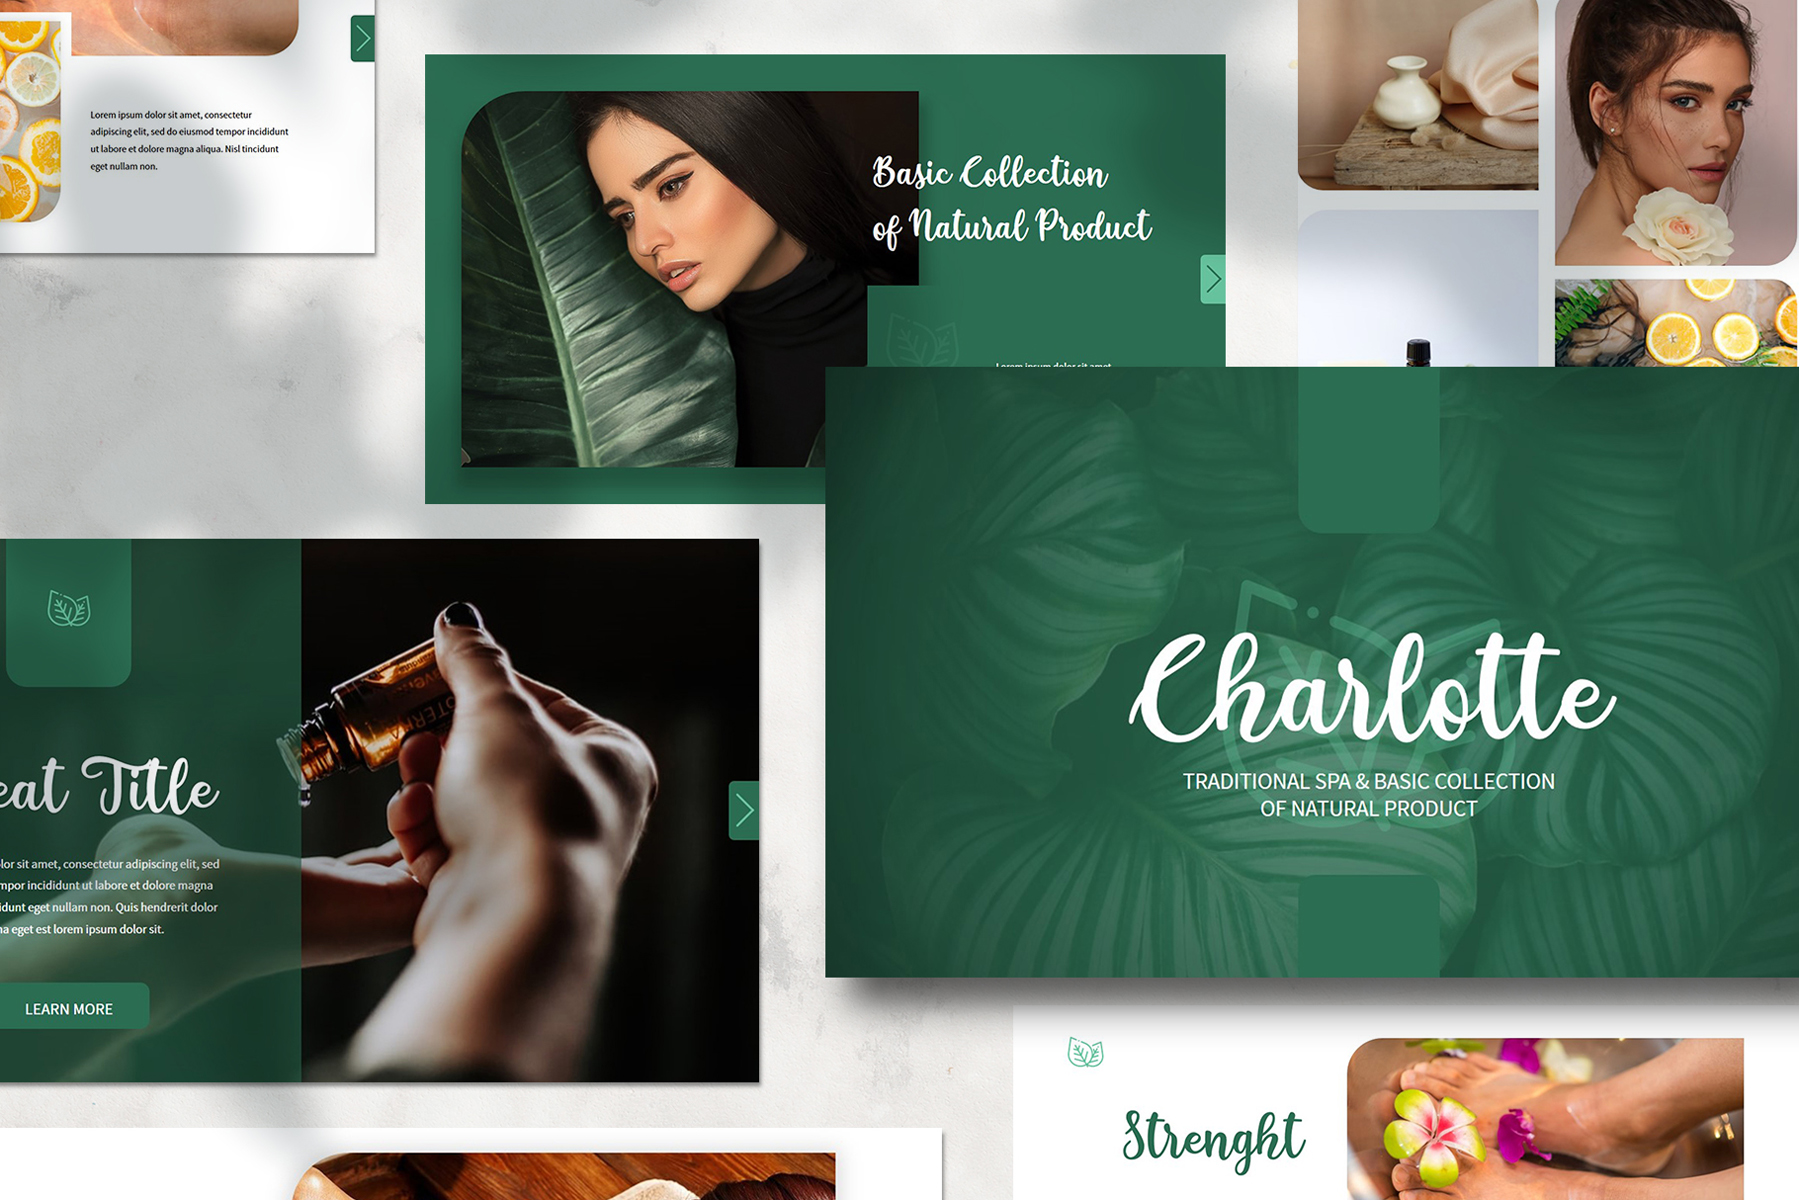 Charlotte Presentation PowerPoint Template